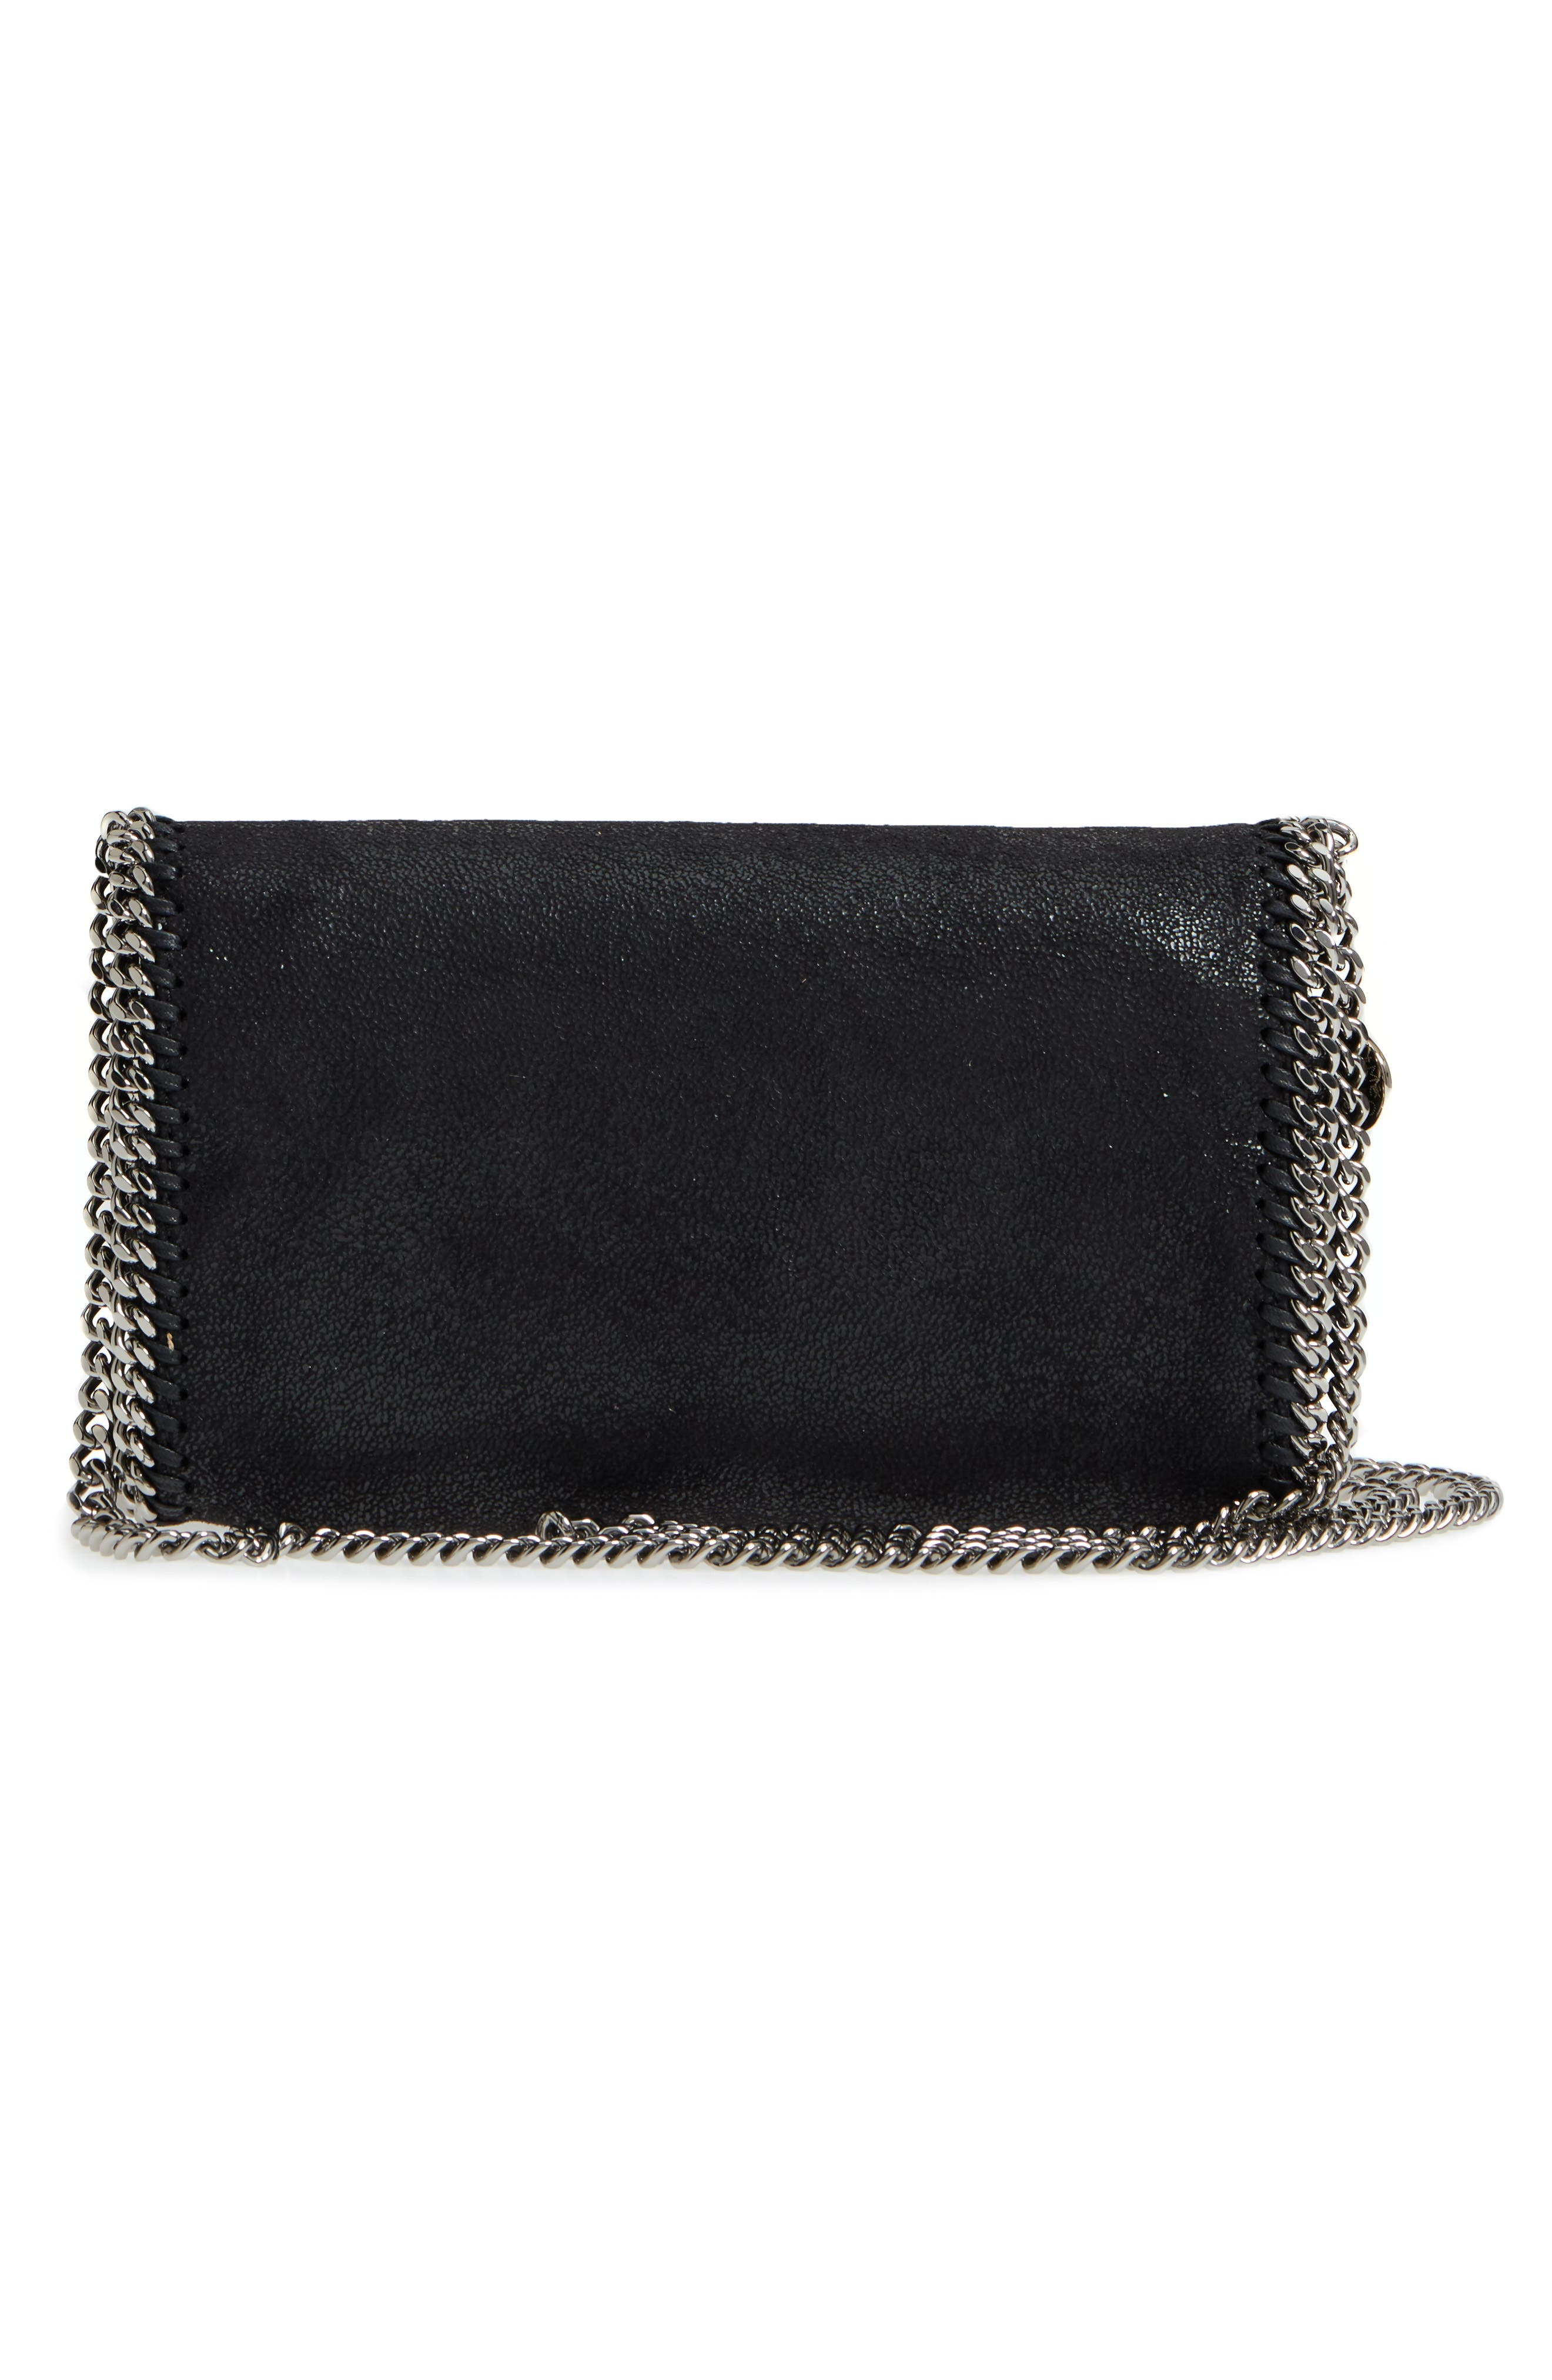 'Falabella - Shaggy Deer' Faux Leather Crossbody Bag,                             Alternate thumbnail 3, color,                             BLACK SLVR HRDWR